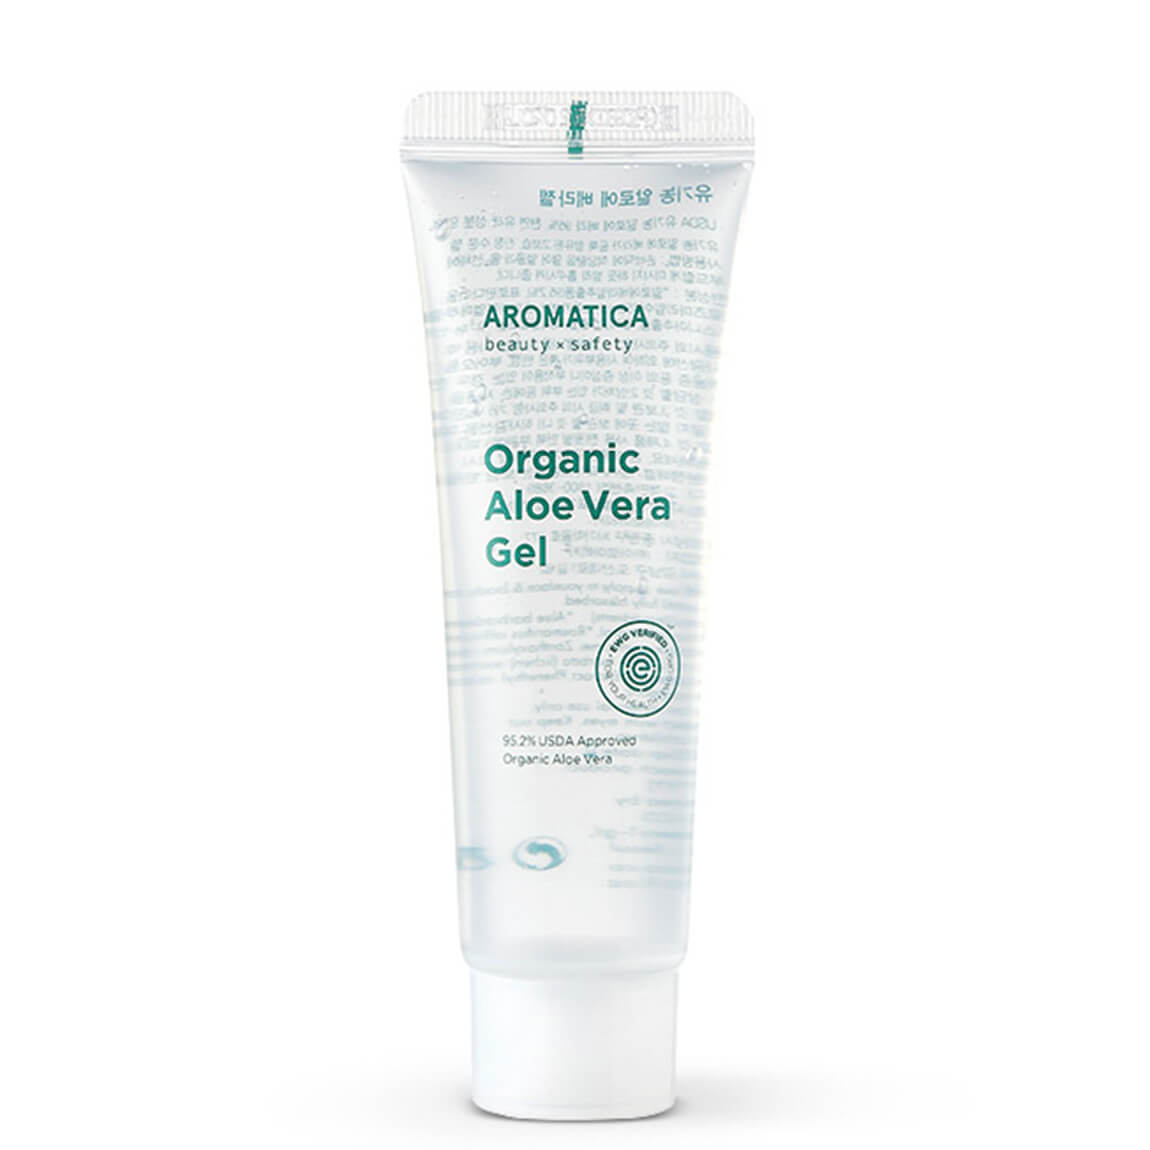 Aromatica 95% Organic Aloe Vera Gel Mini 50ml